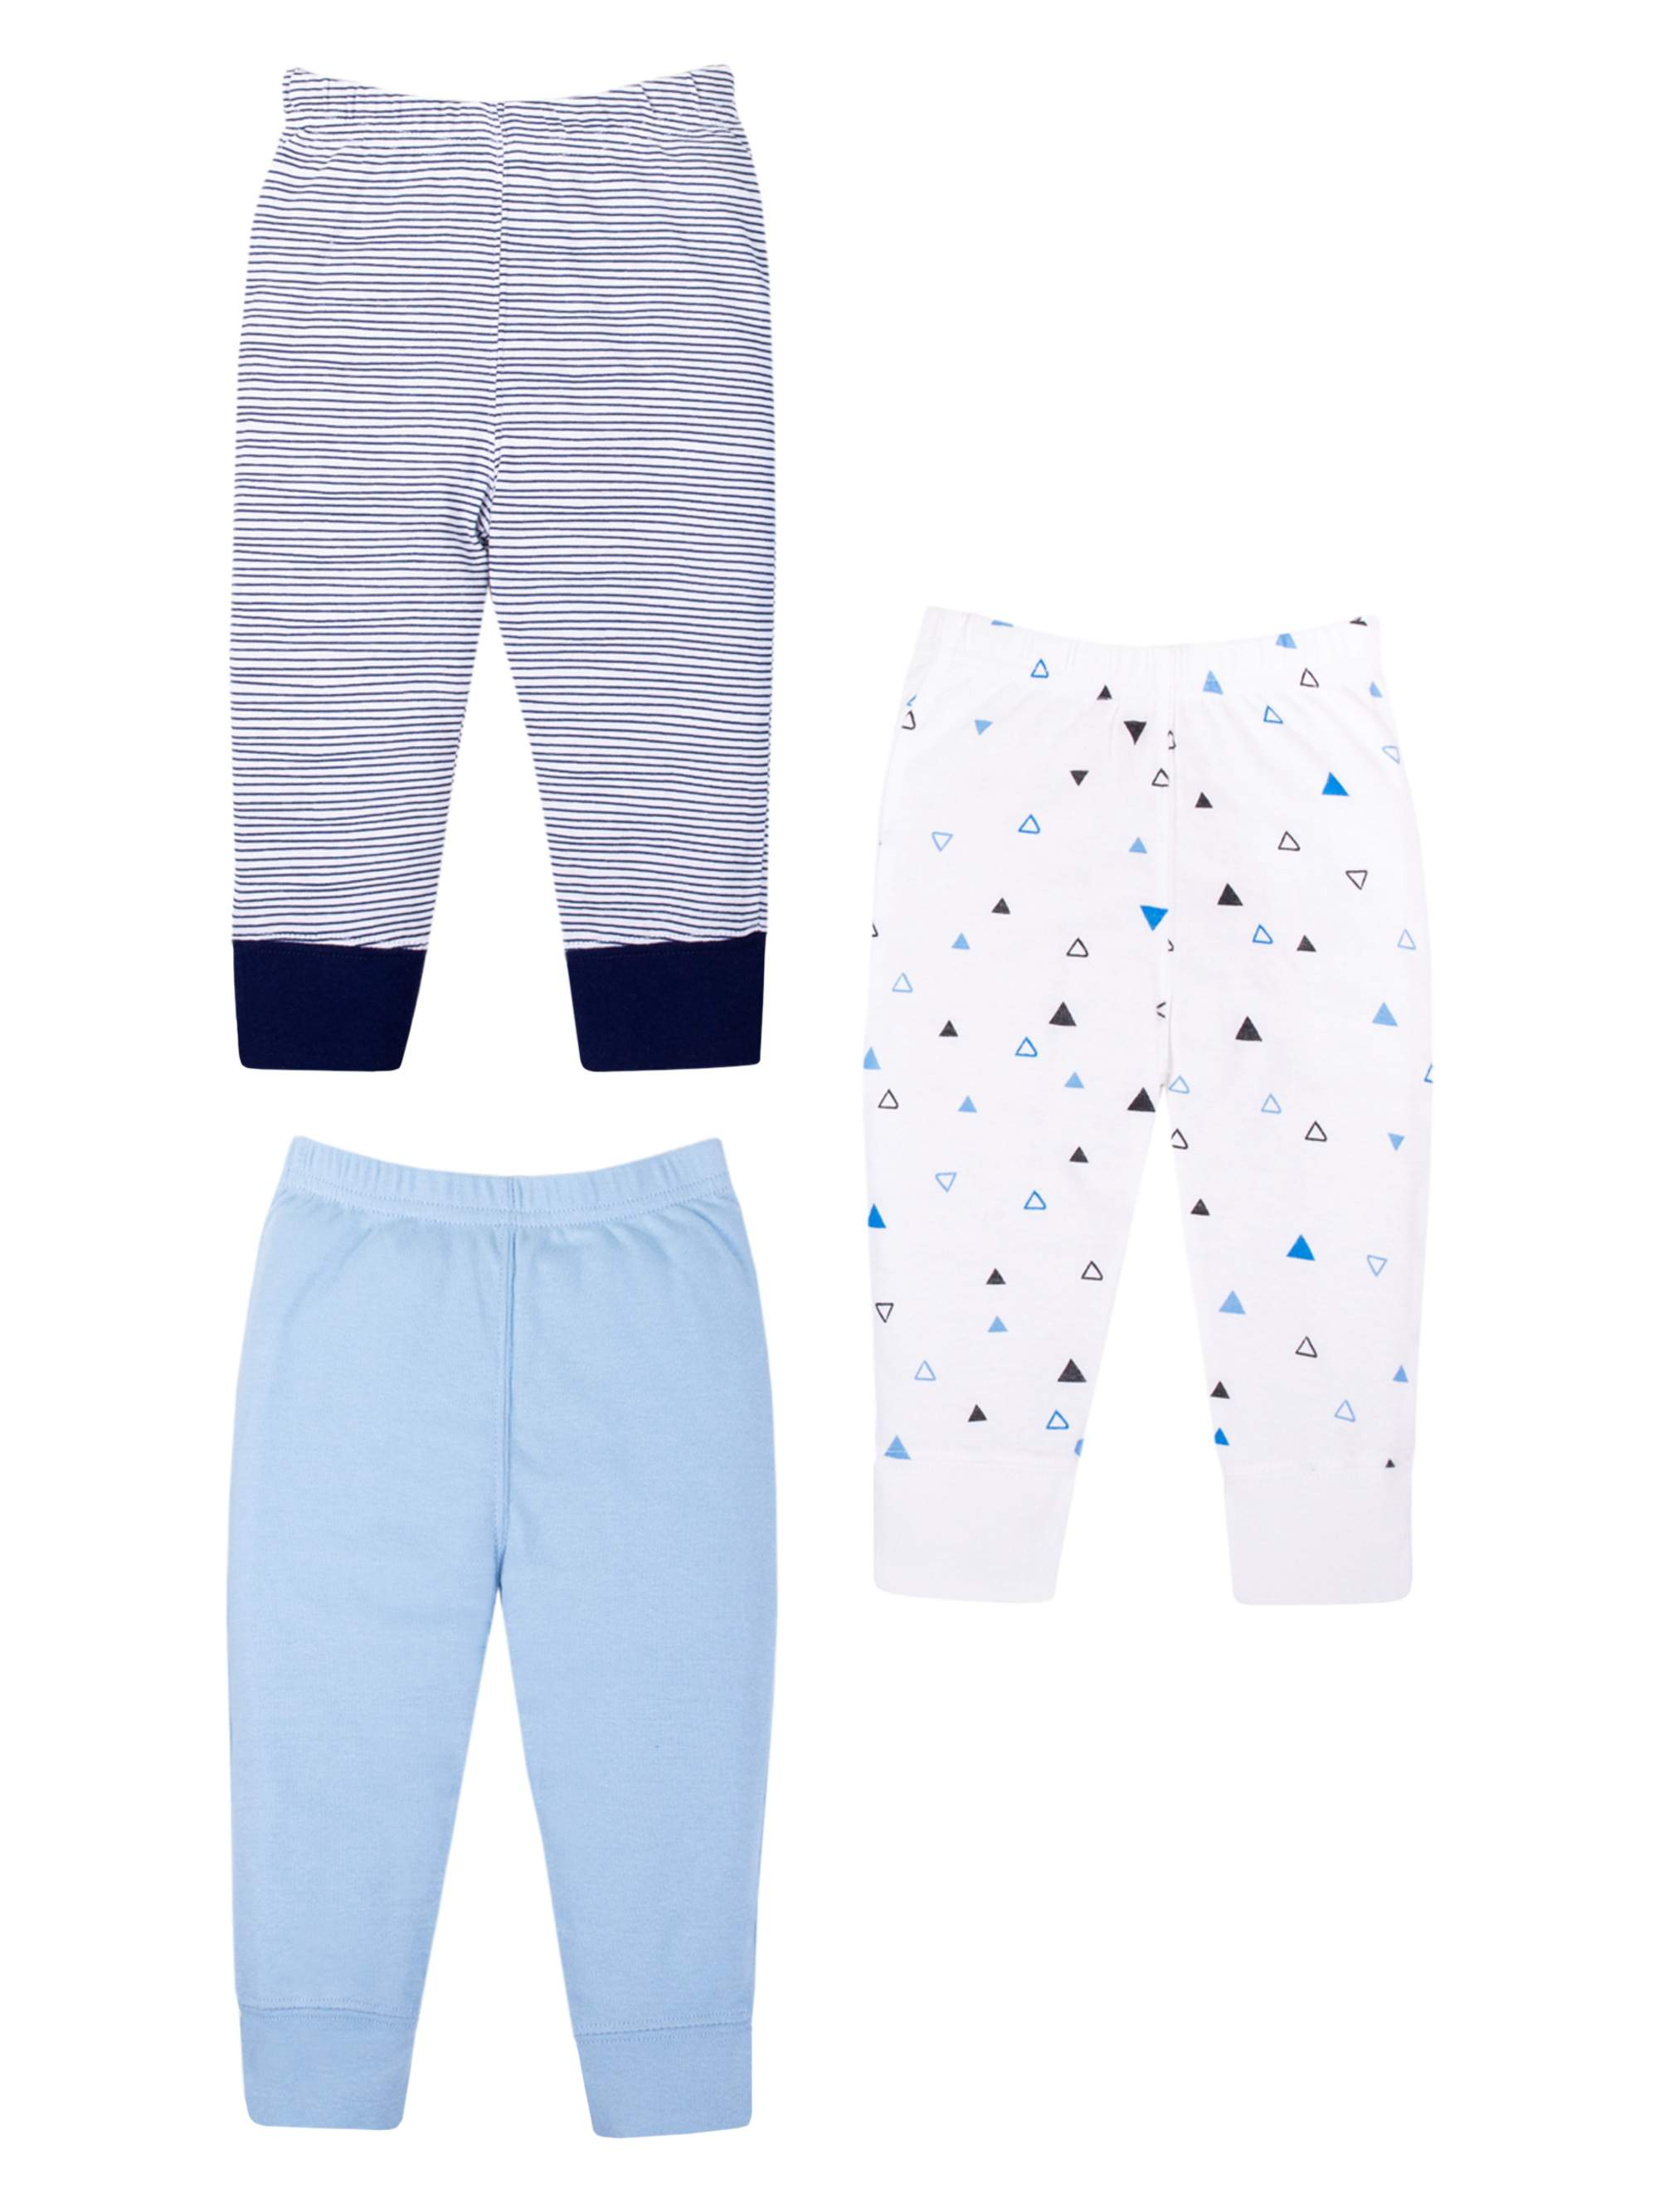 Little Star Organic Knits Pants, 3-pack (Baby Boys)